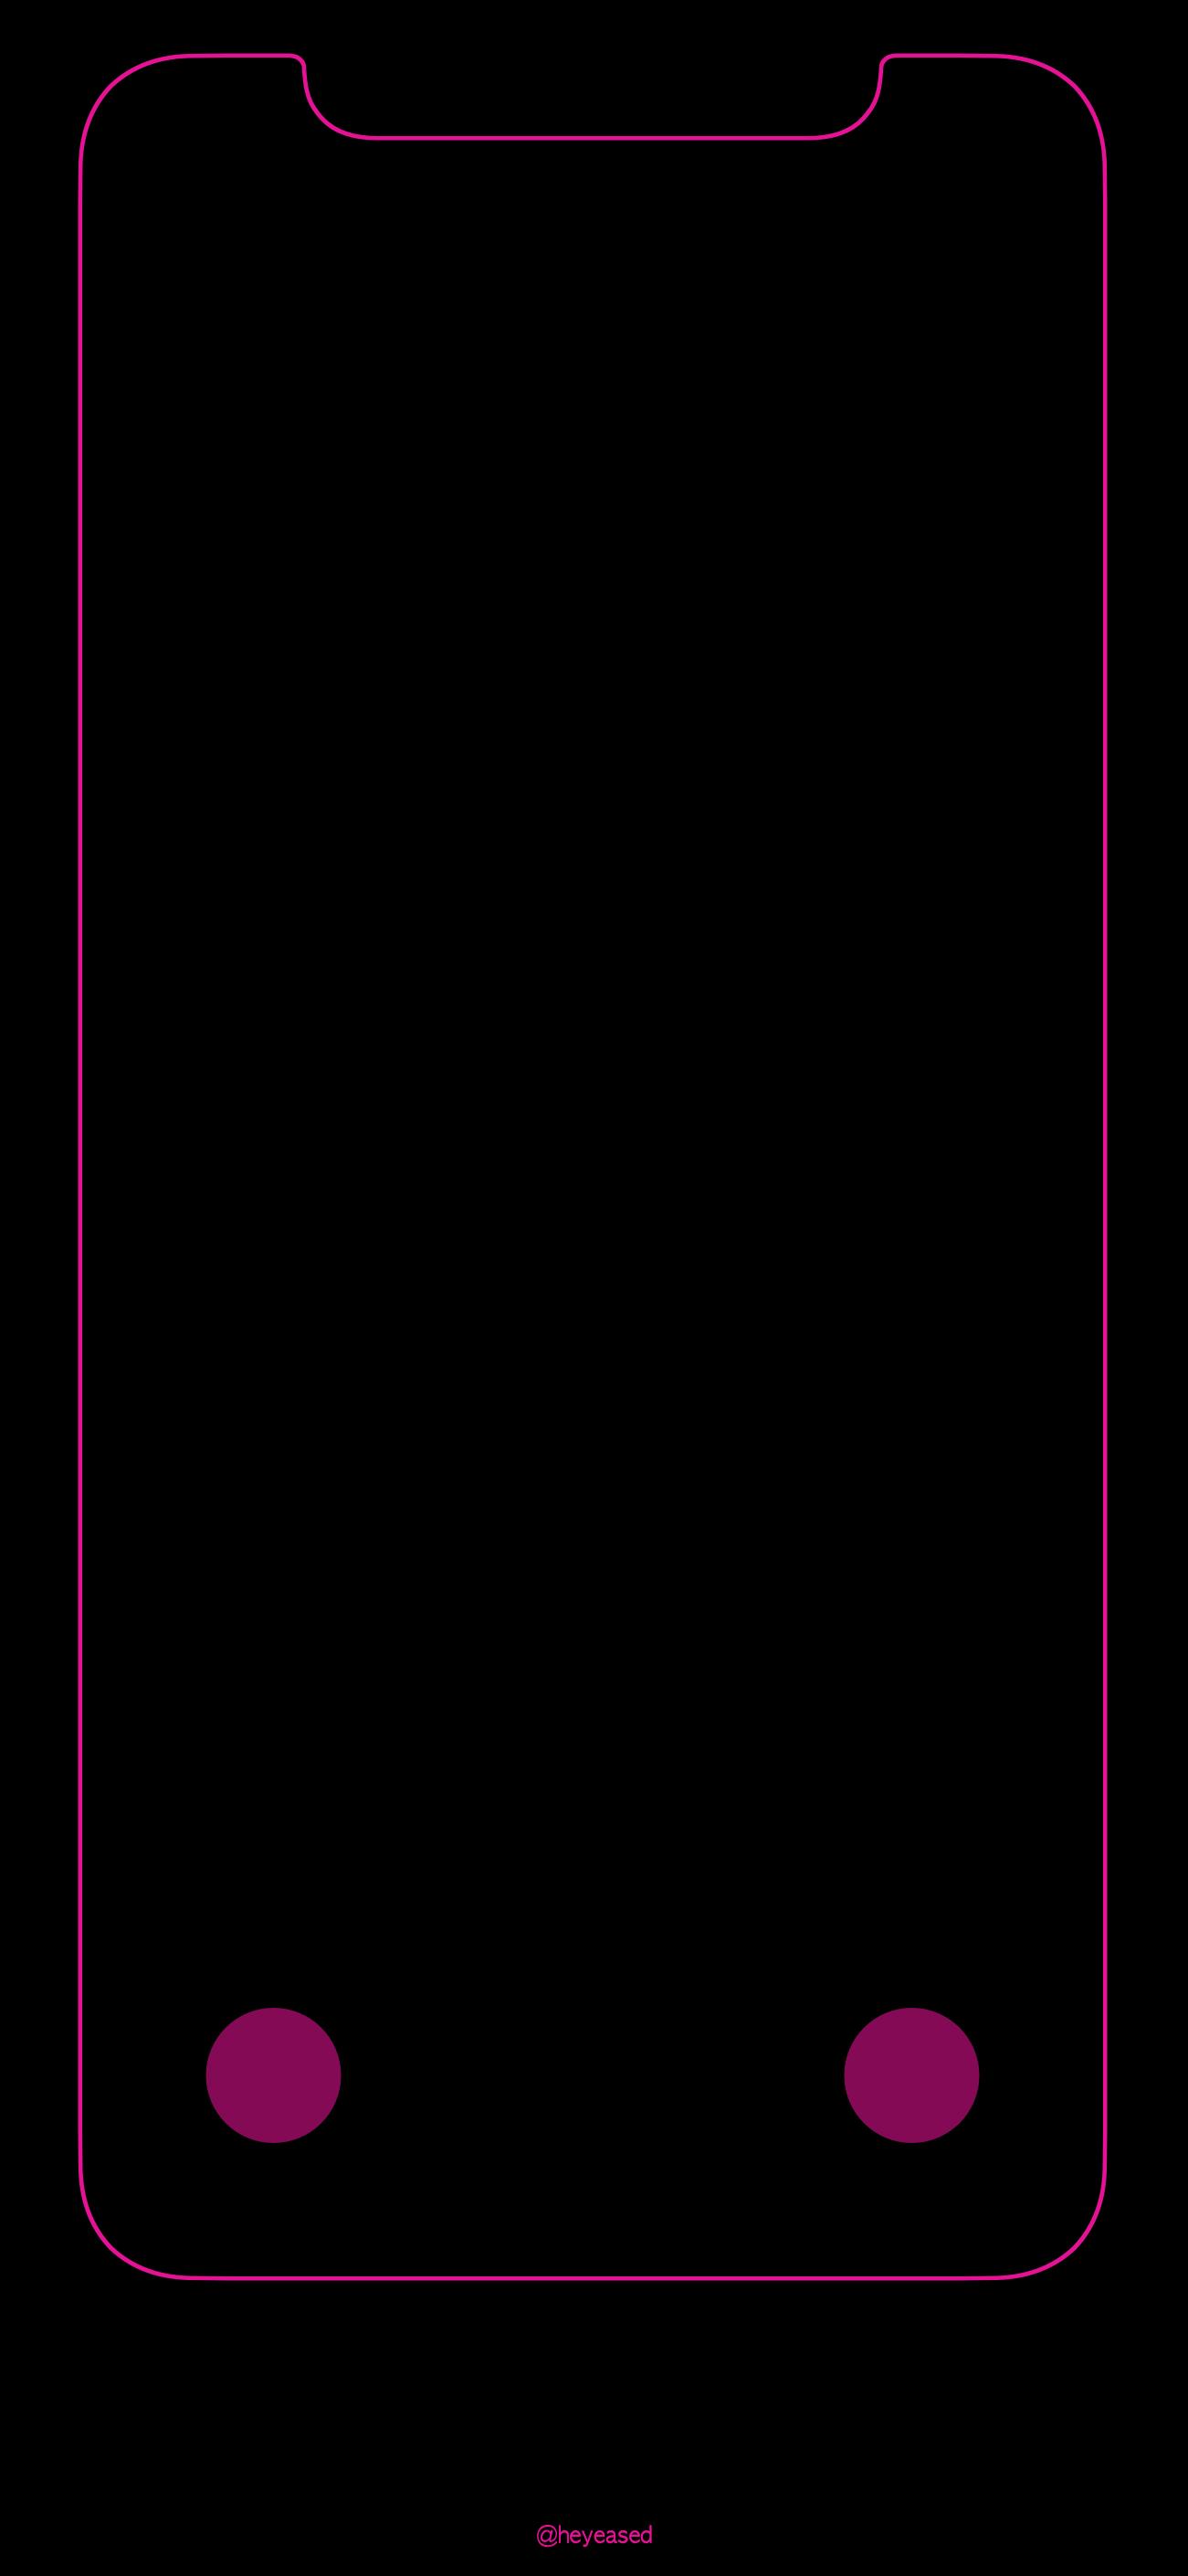 The X Color Lock Pink Png 1 301 2 820 Pixels Iphone Background Wallpaper Wallpaper Edge Apple Wallpaper